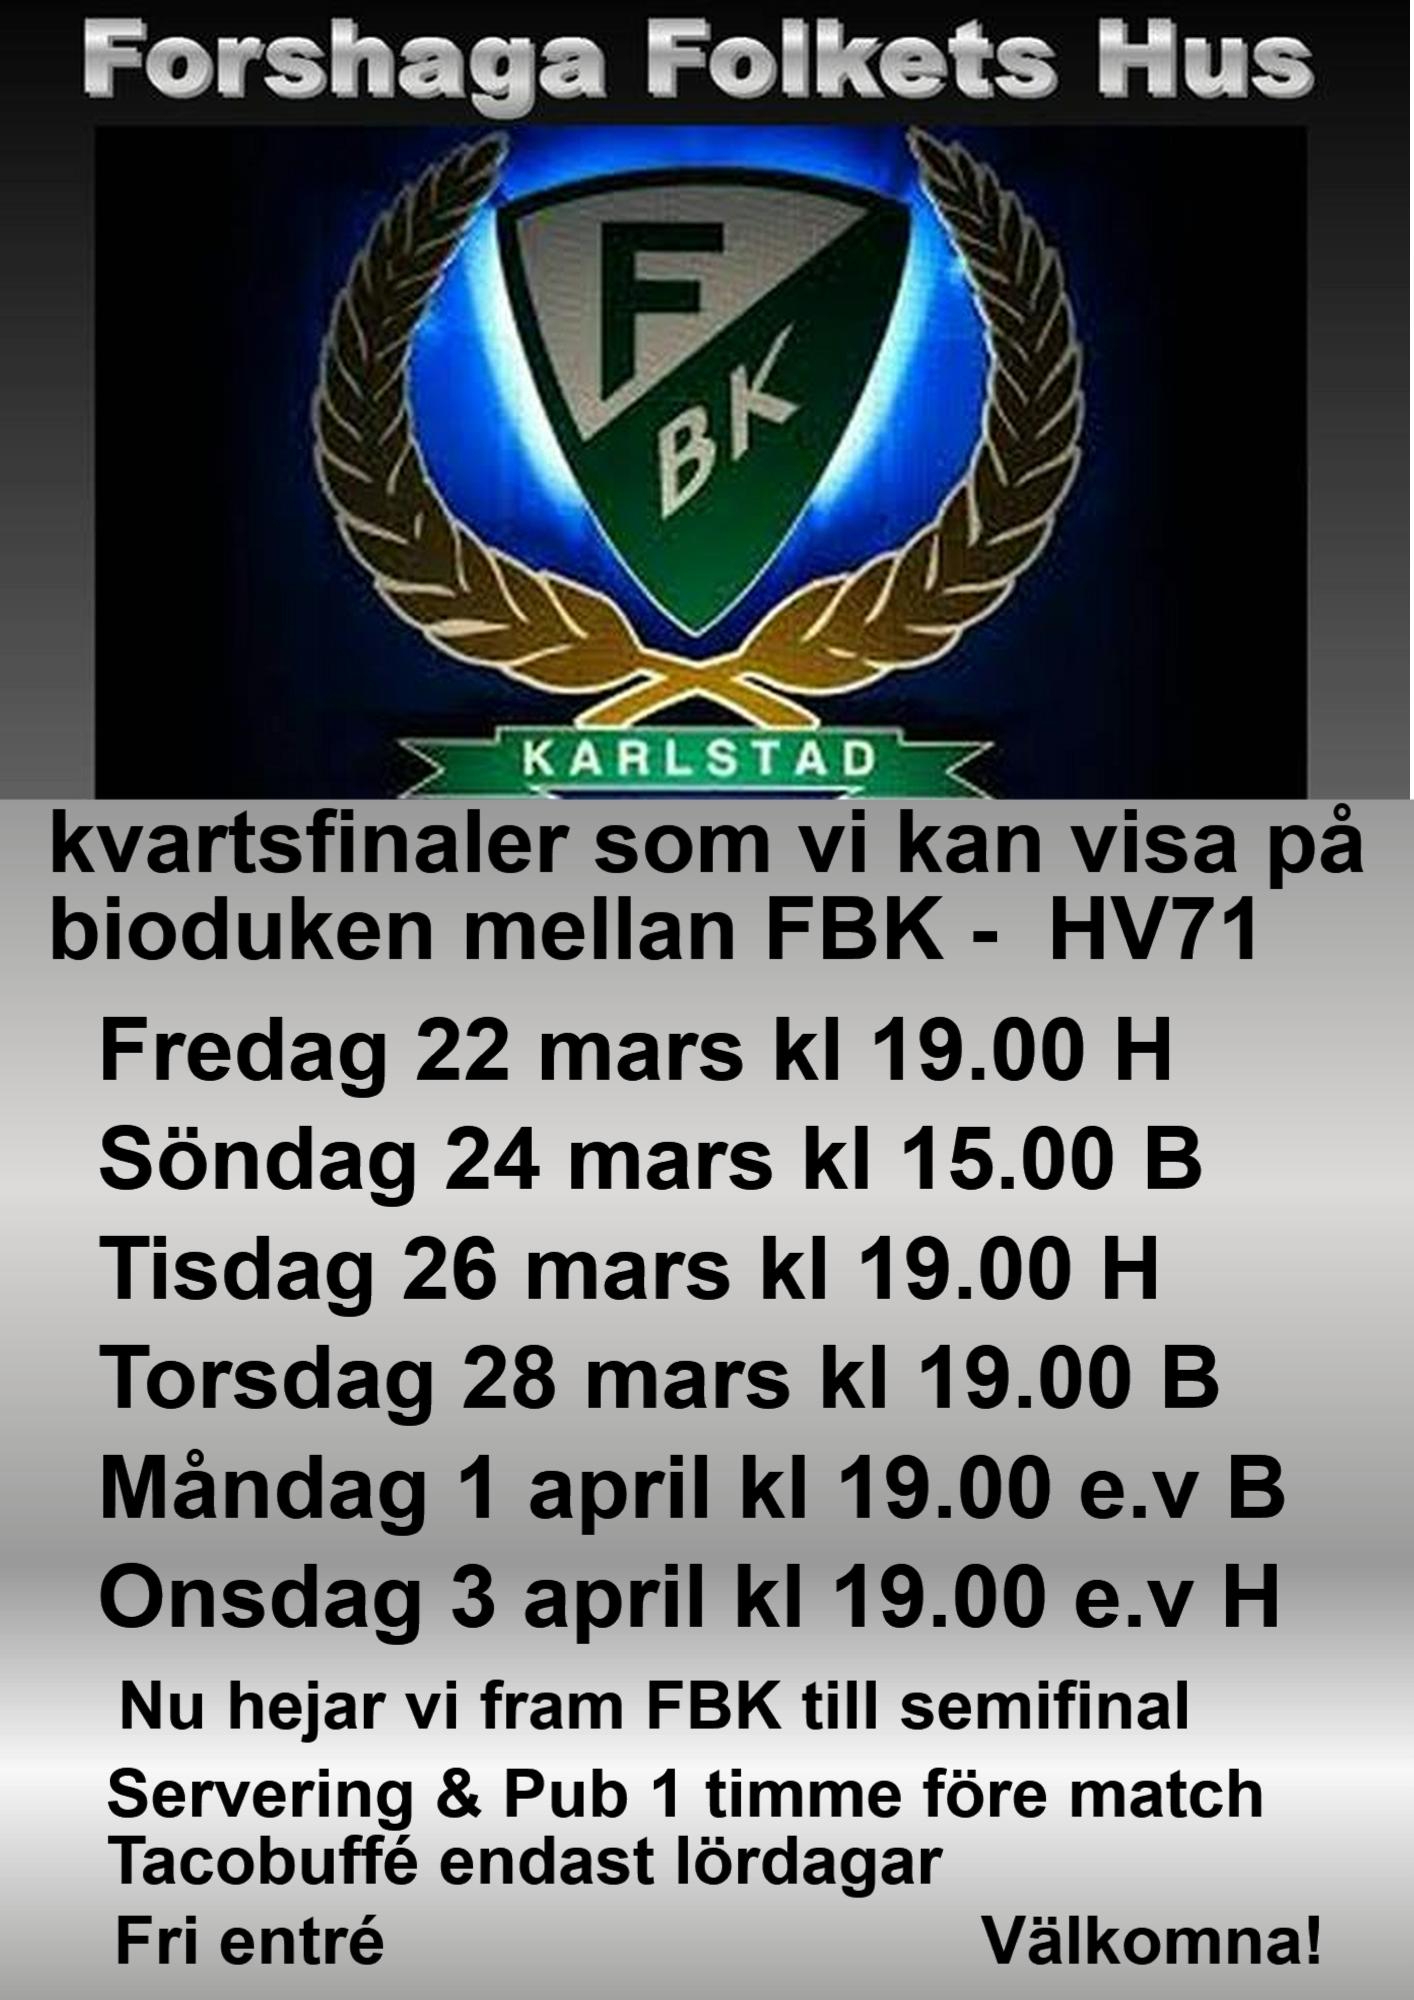 FBKs kvartsfinaler på bioduken